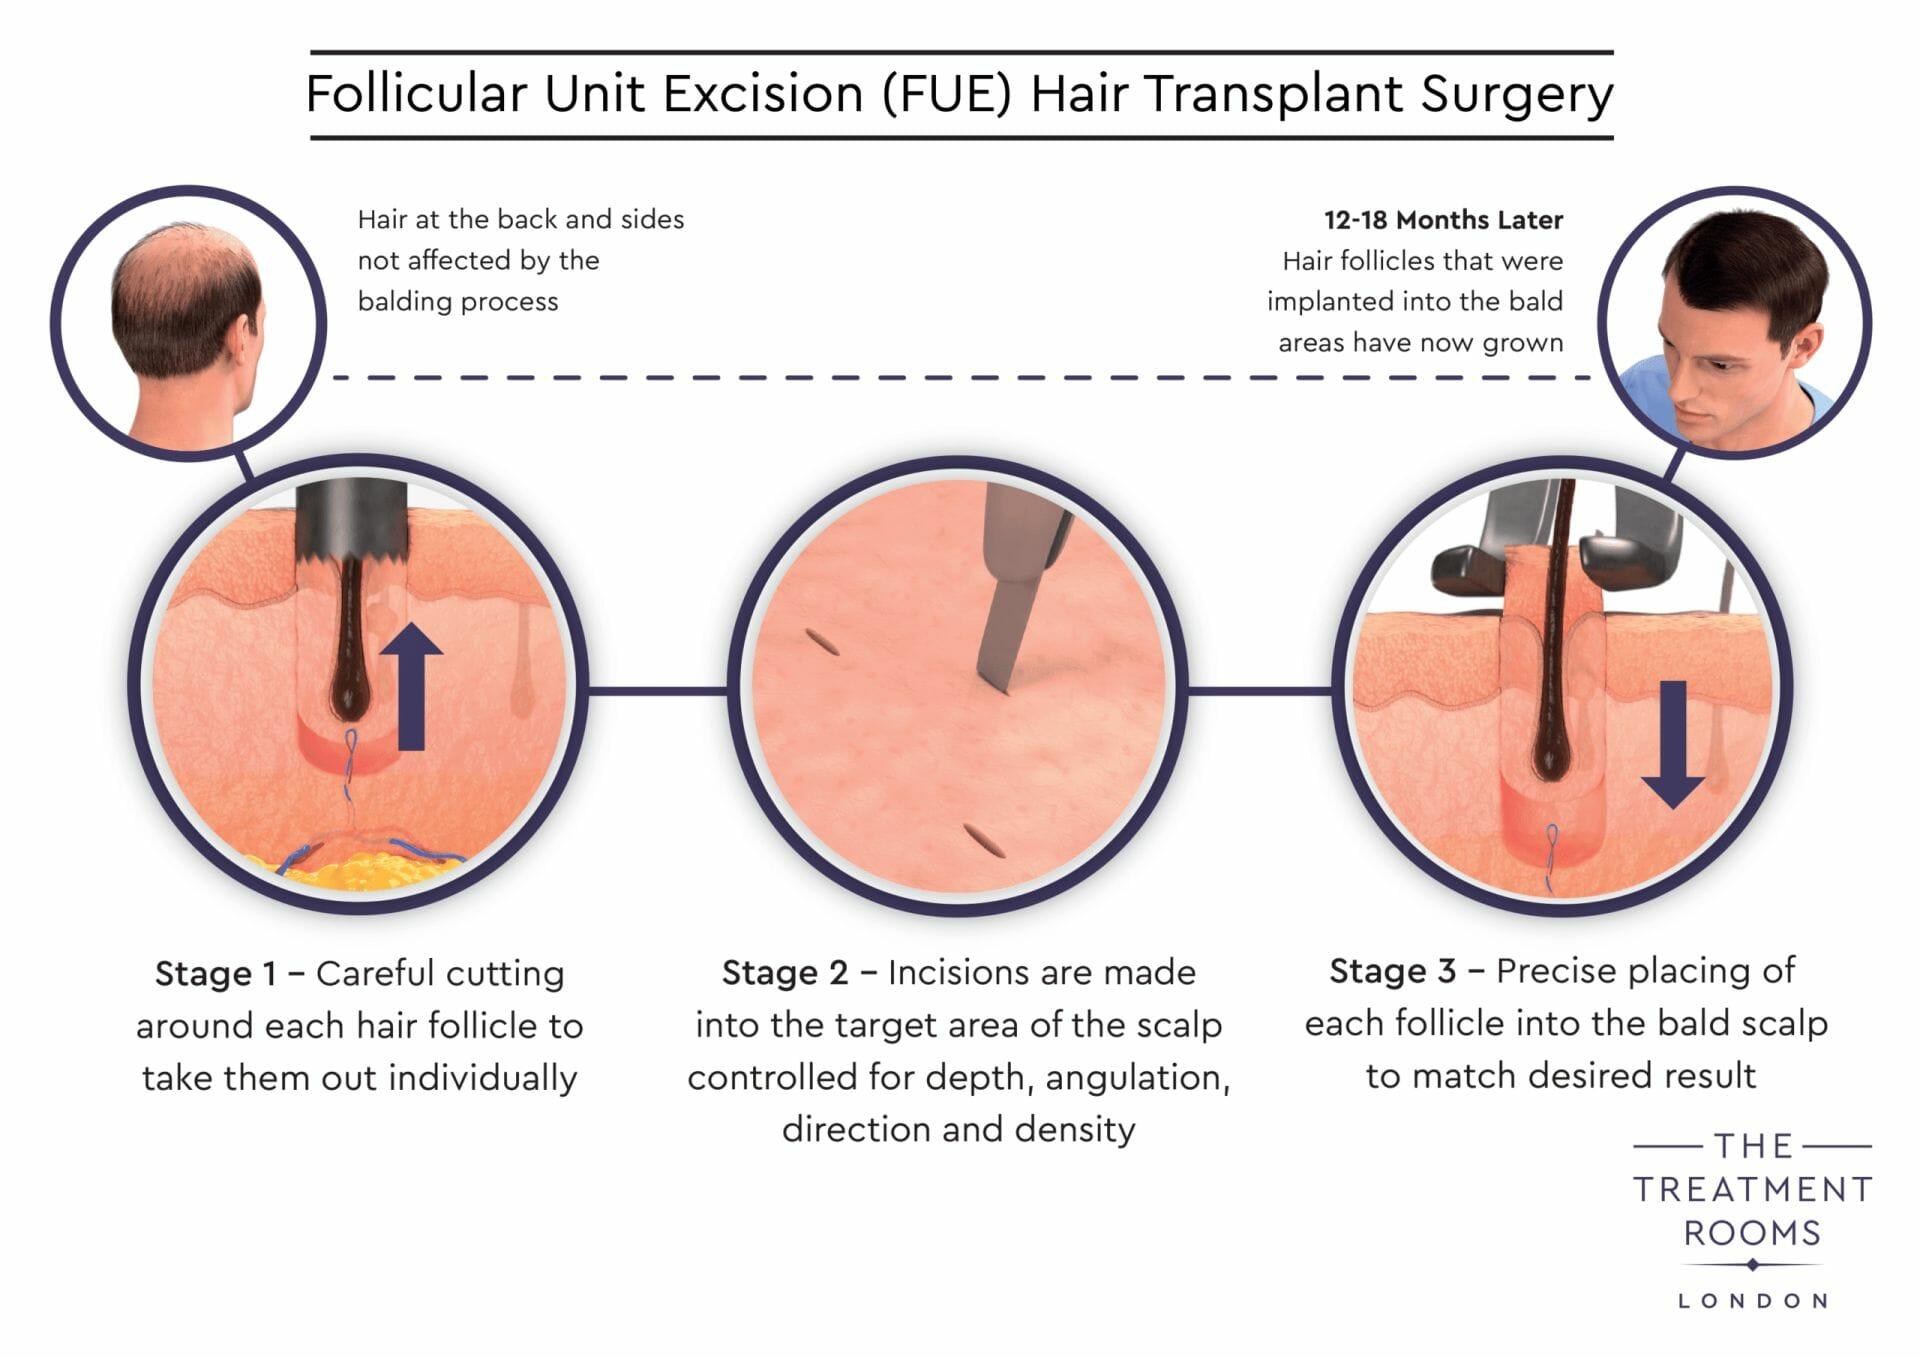 FUE hair transplant surgery diagram